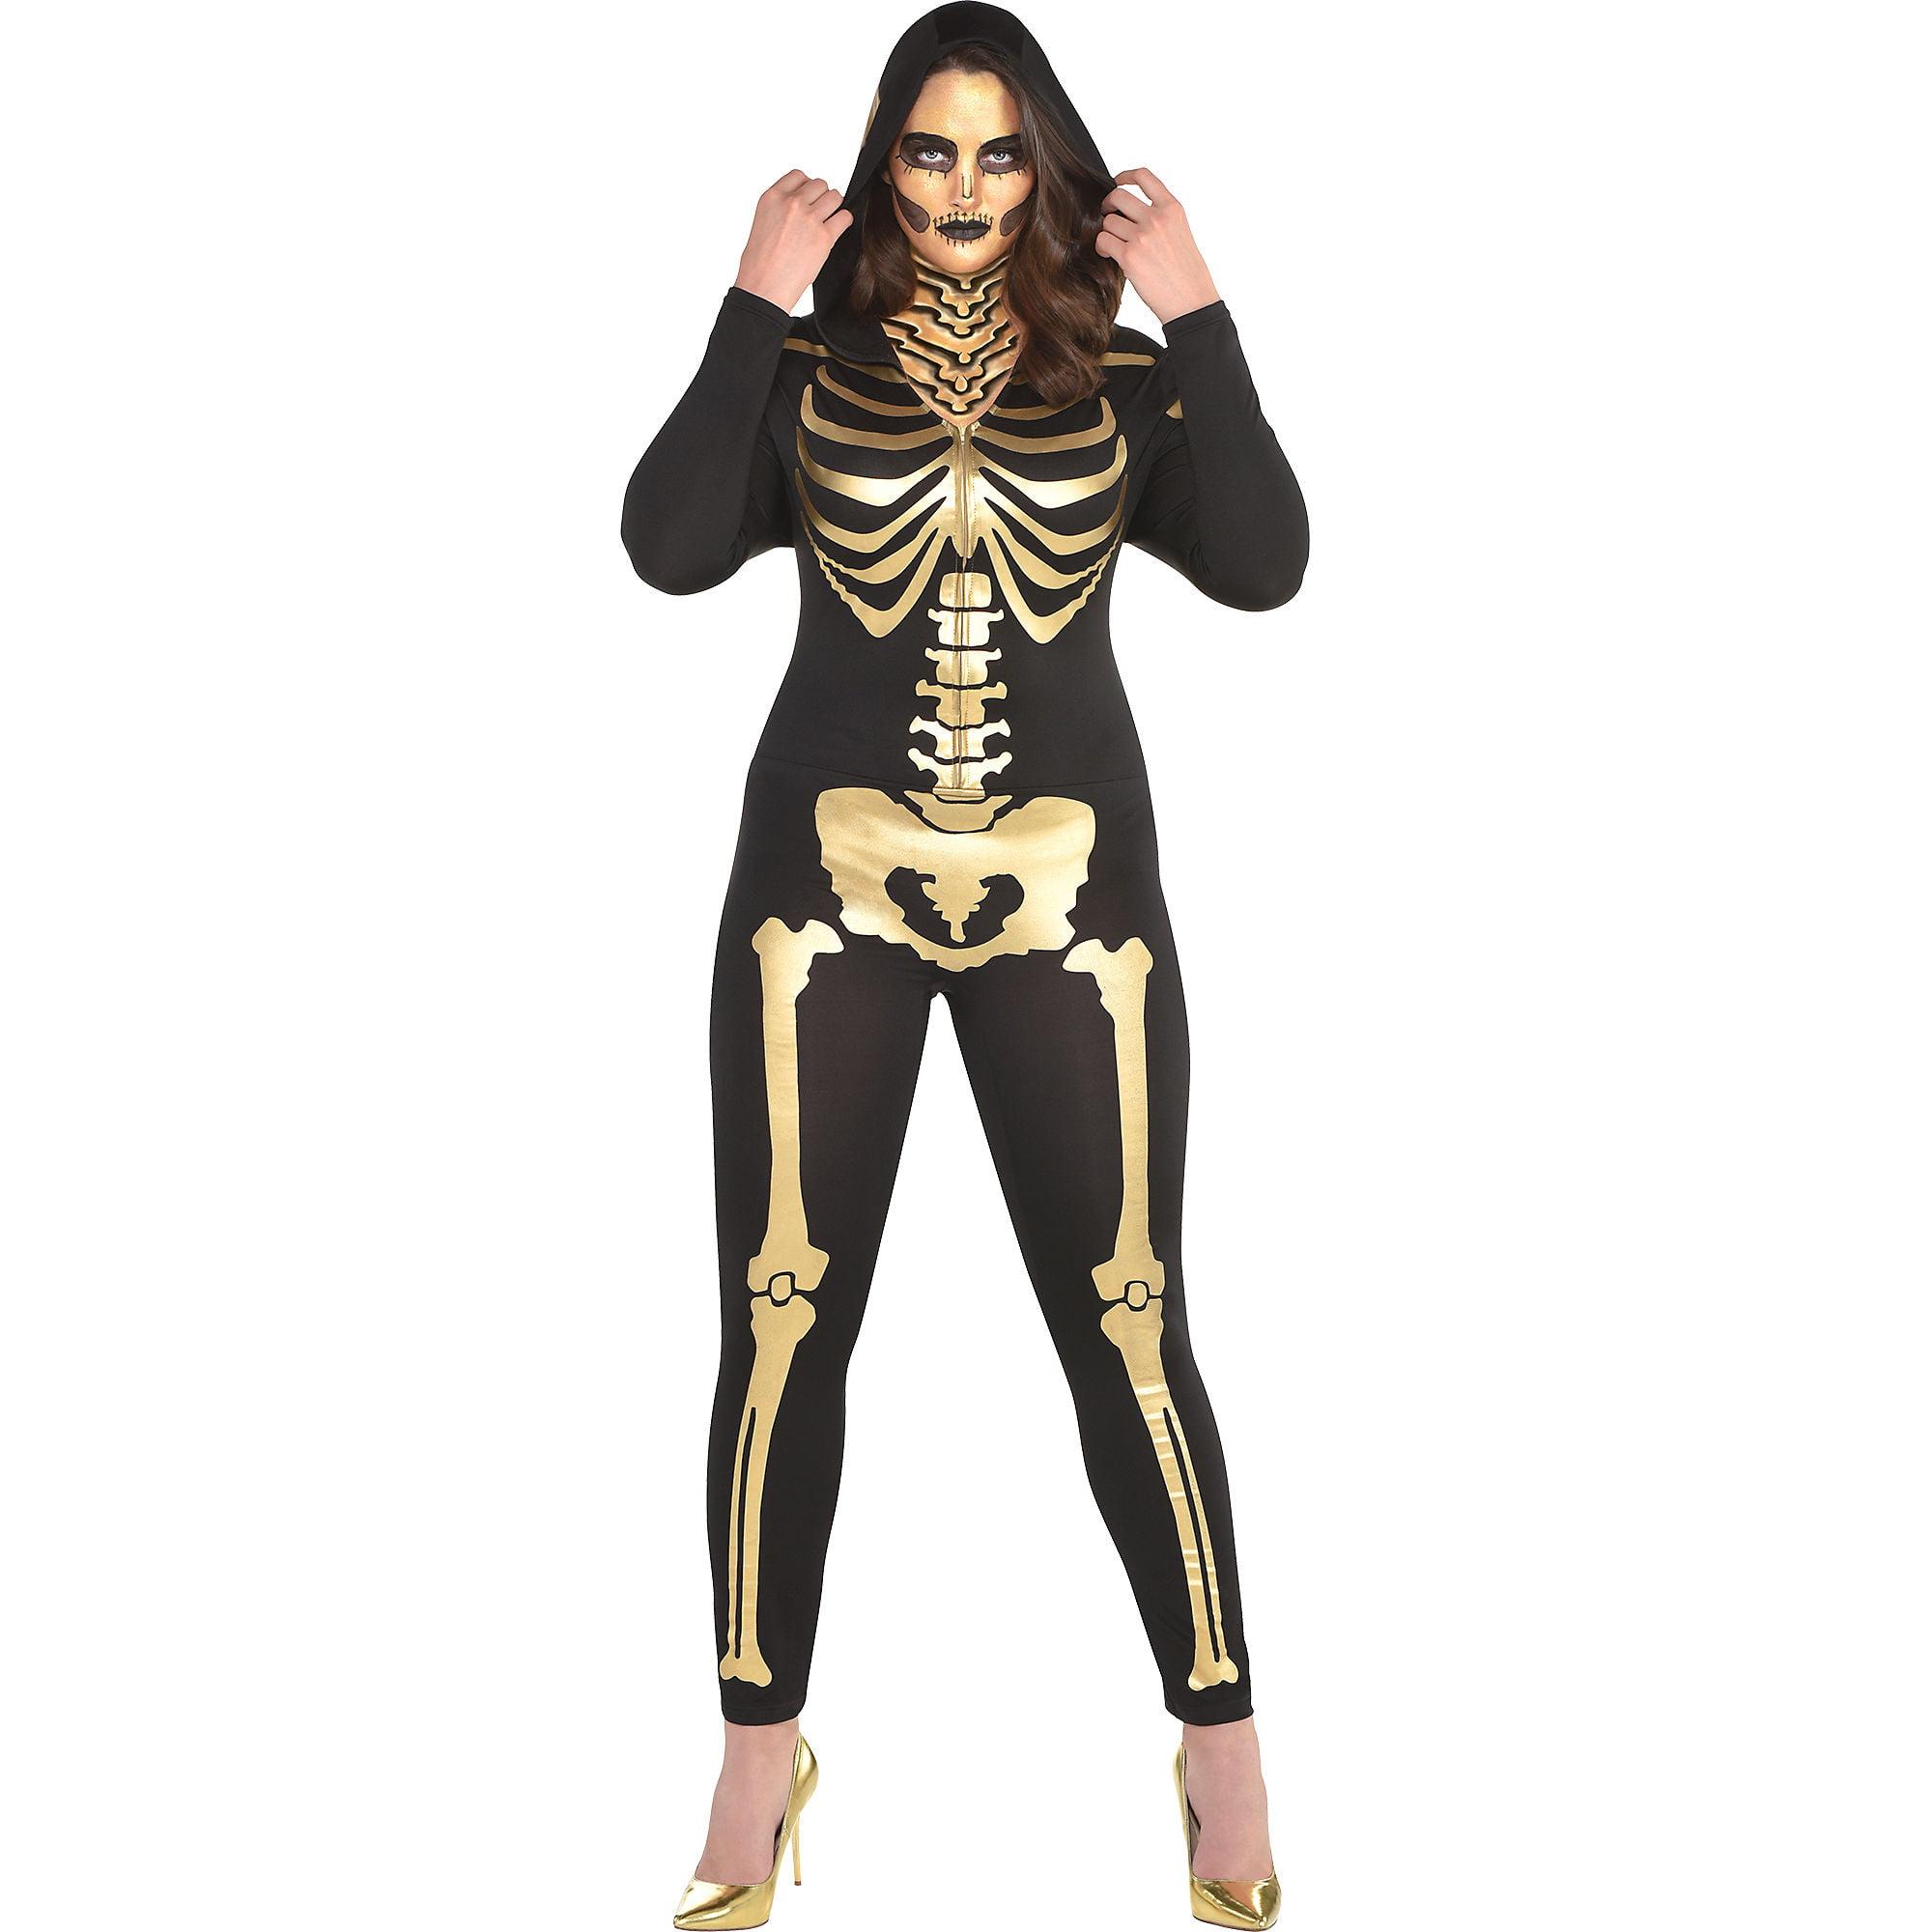 Skeleton Baby Bones Costume Toddler Halloween Fancy Dress Costume 6-24 Months